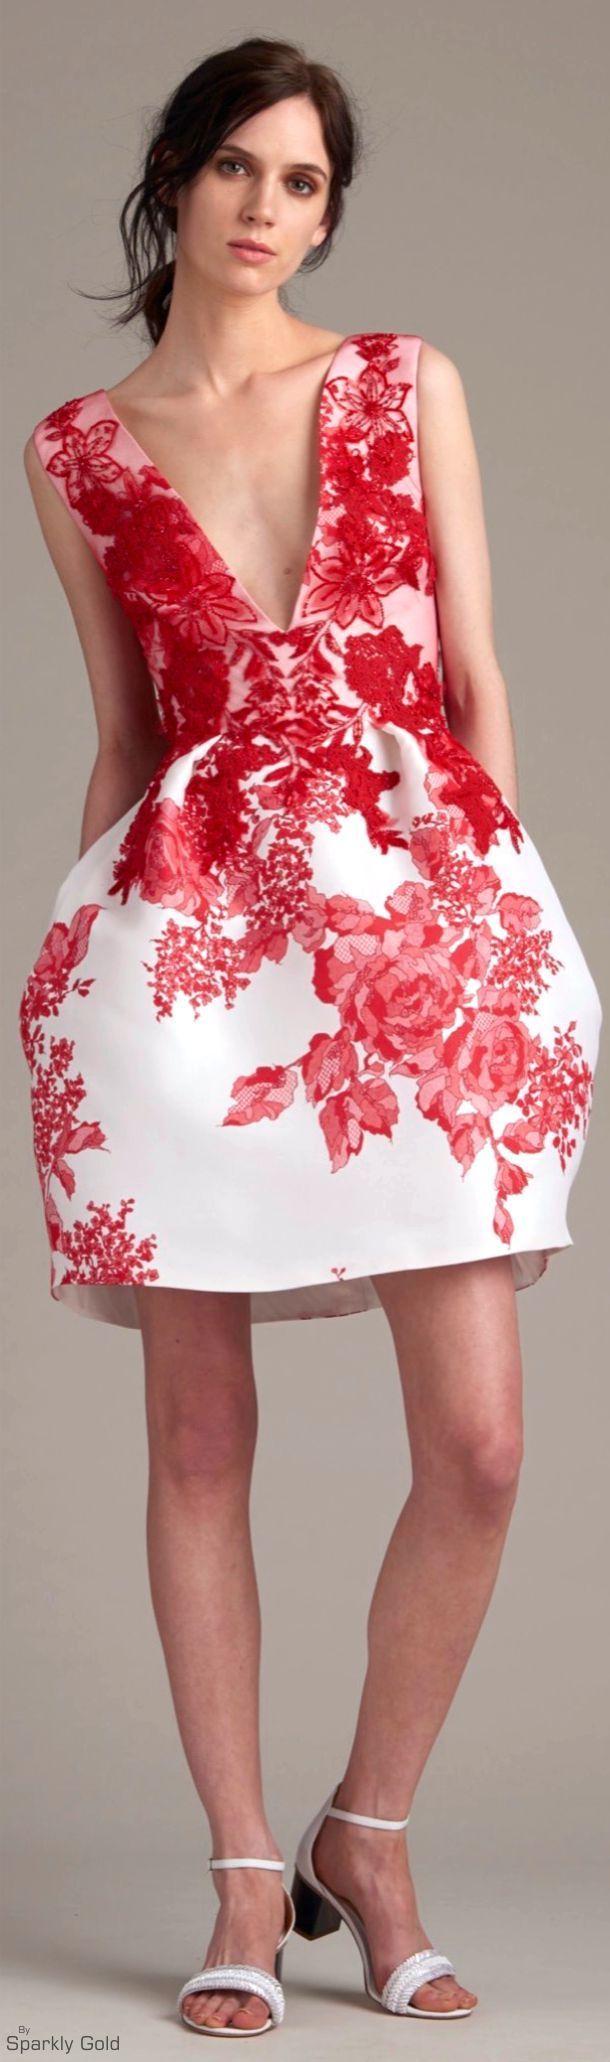 Atractivo Gatsby Inspirado Vestidos De Dama Fotos - Colección de ...